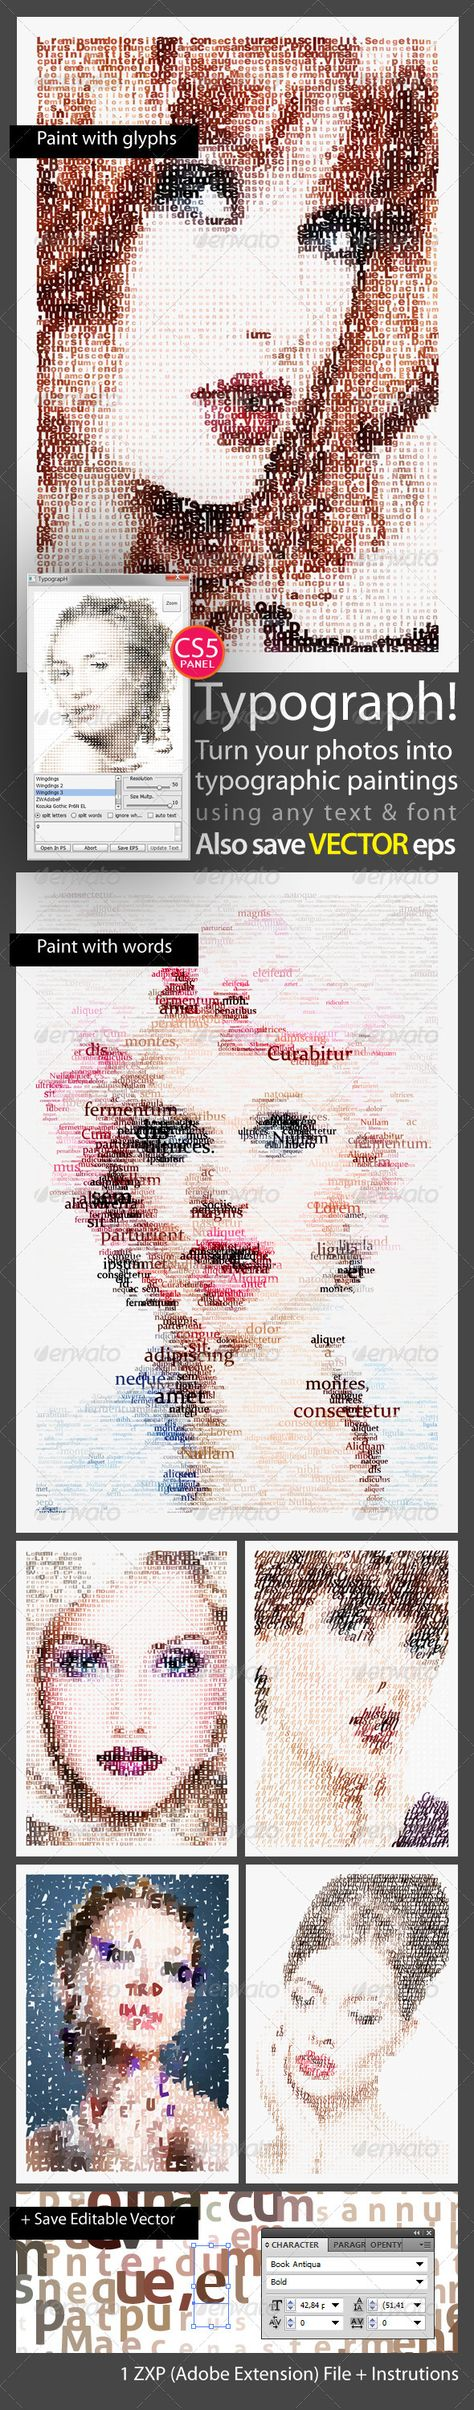 Typograph! by erengoksel